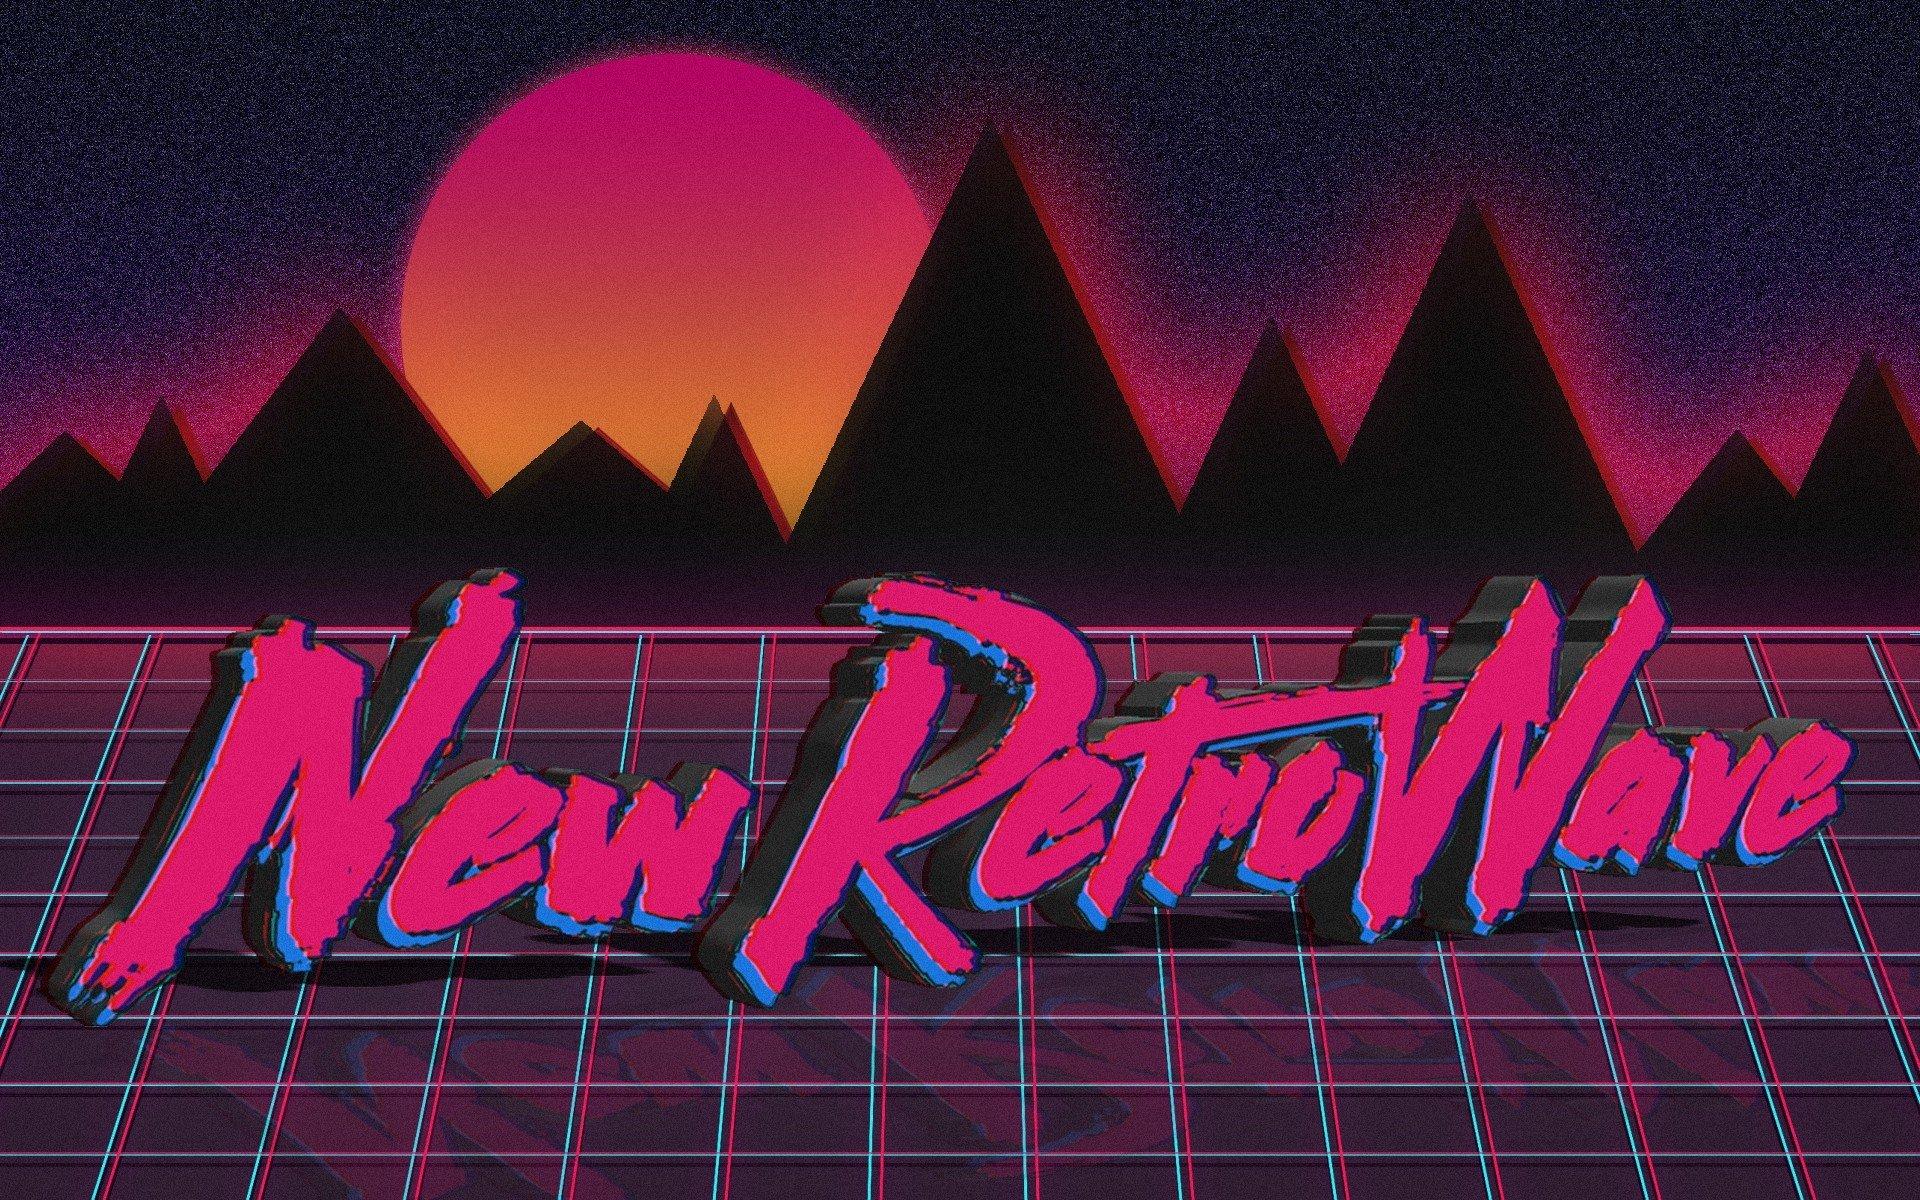 Retro Wave HD Wallpaper | Background Image | 1920x1200 ...